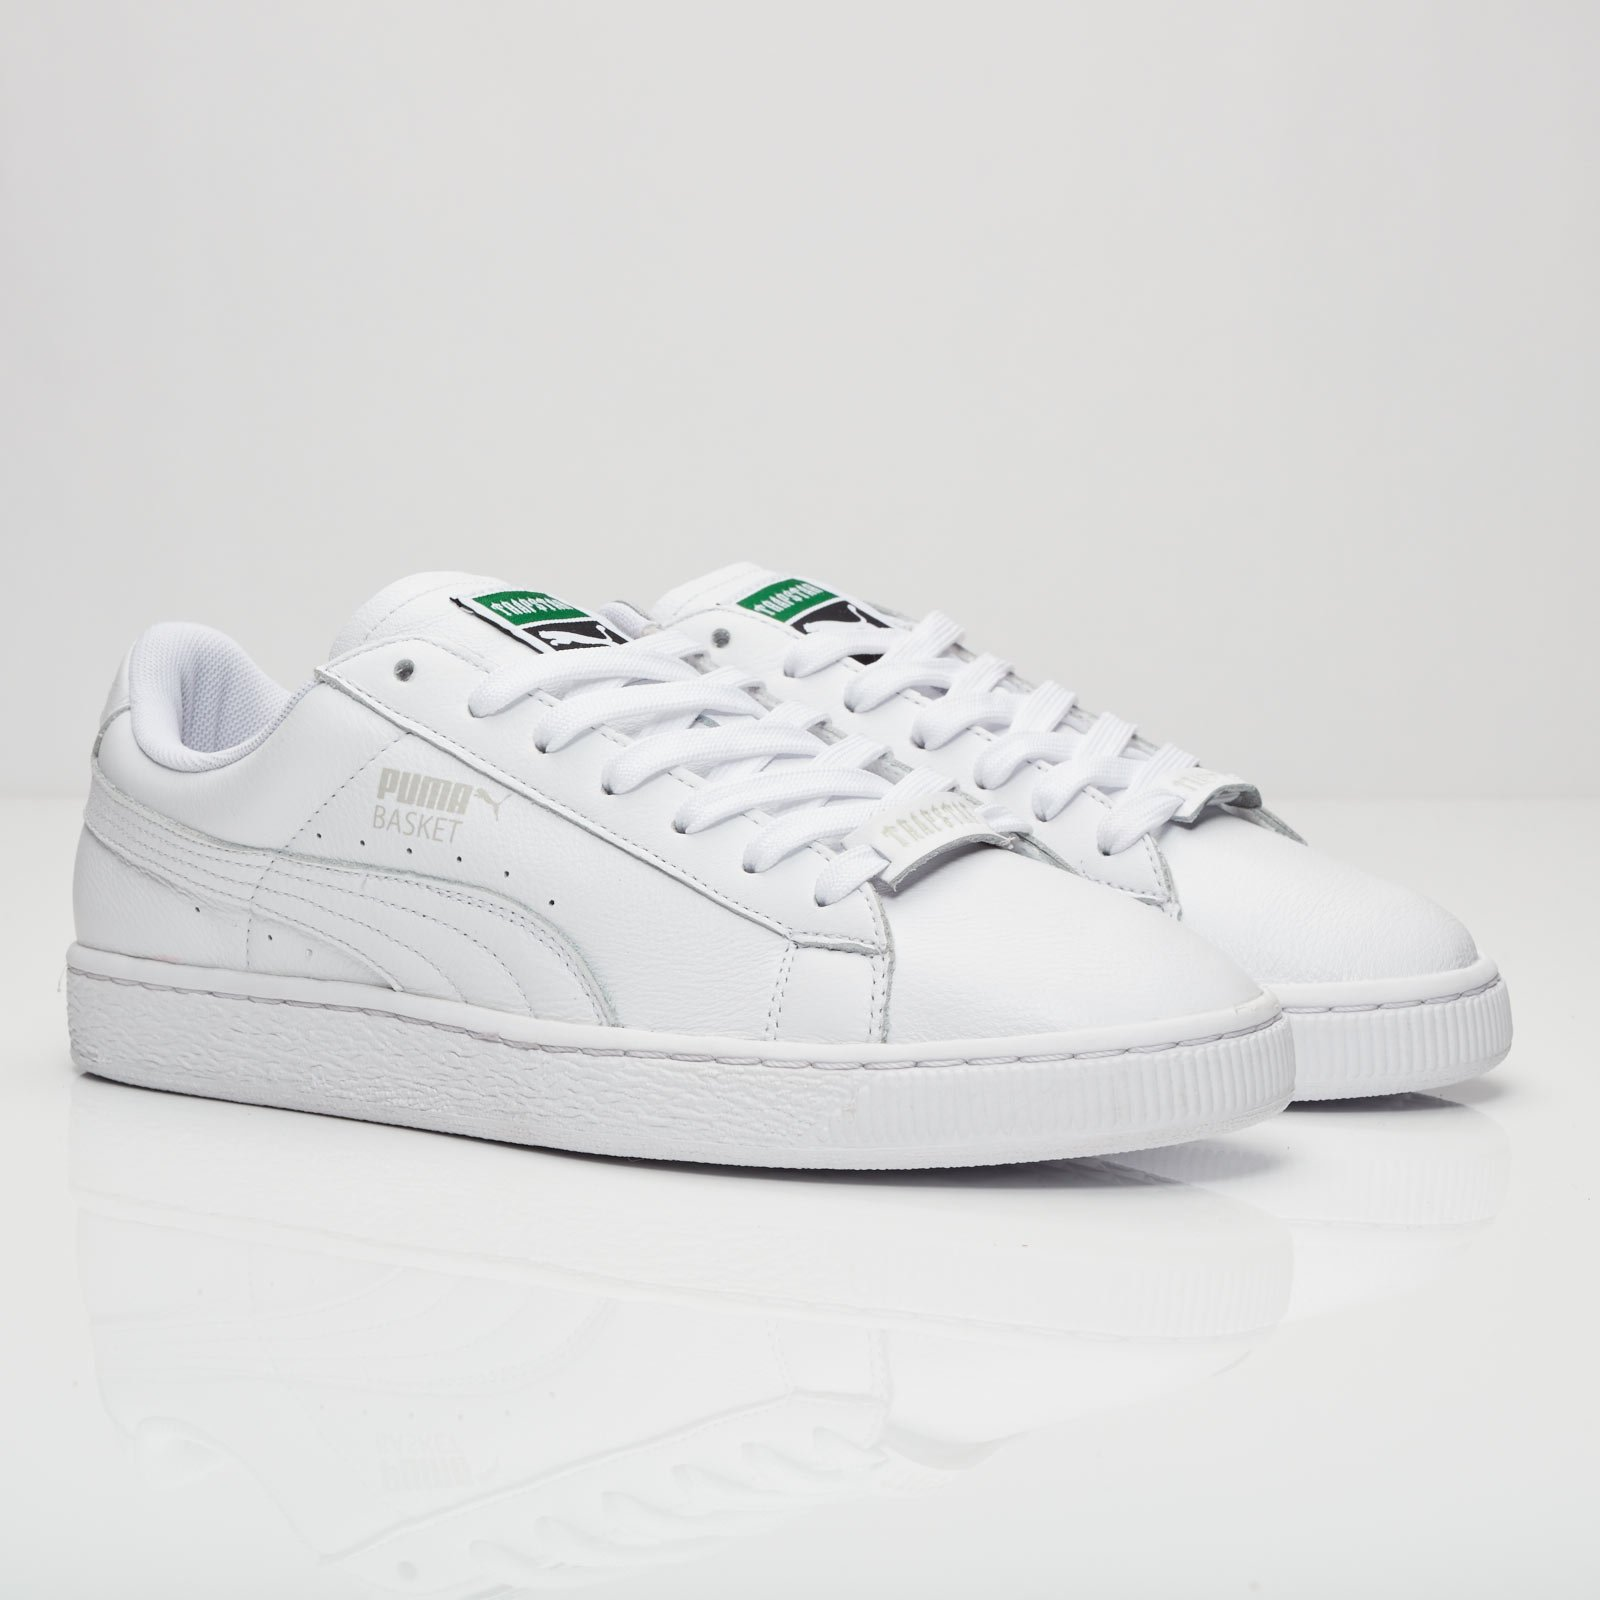 Puma Basket White x TRAPSTAR 361644 01 Sneakersnstuff